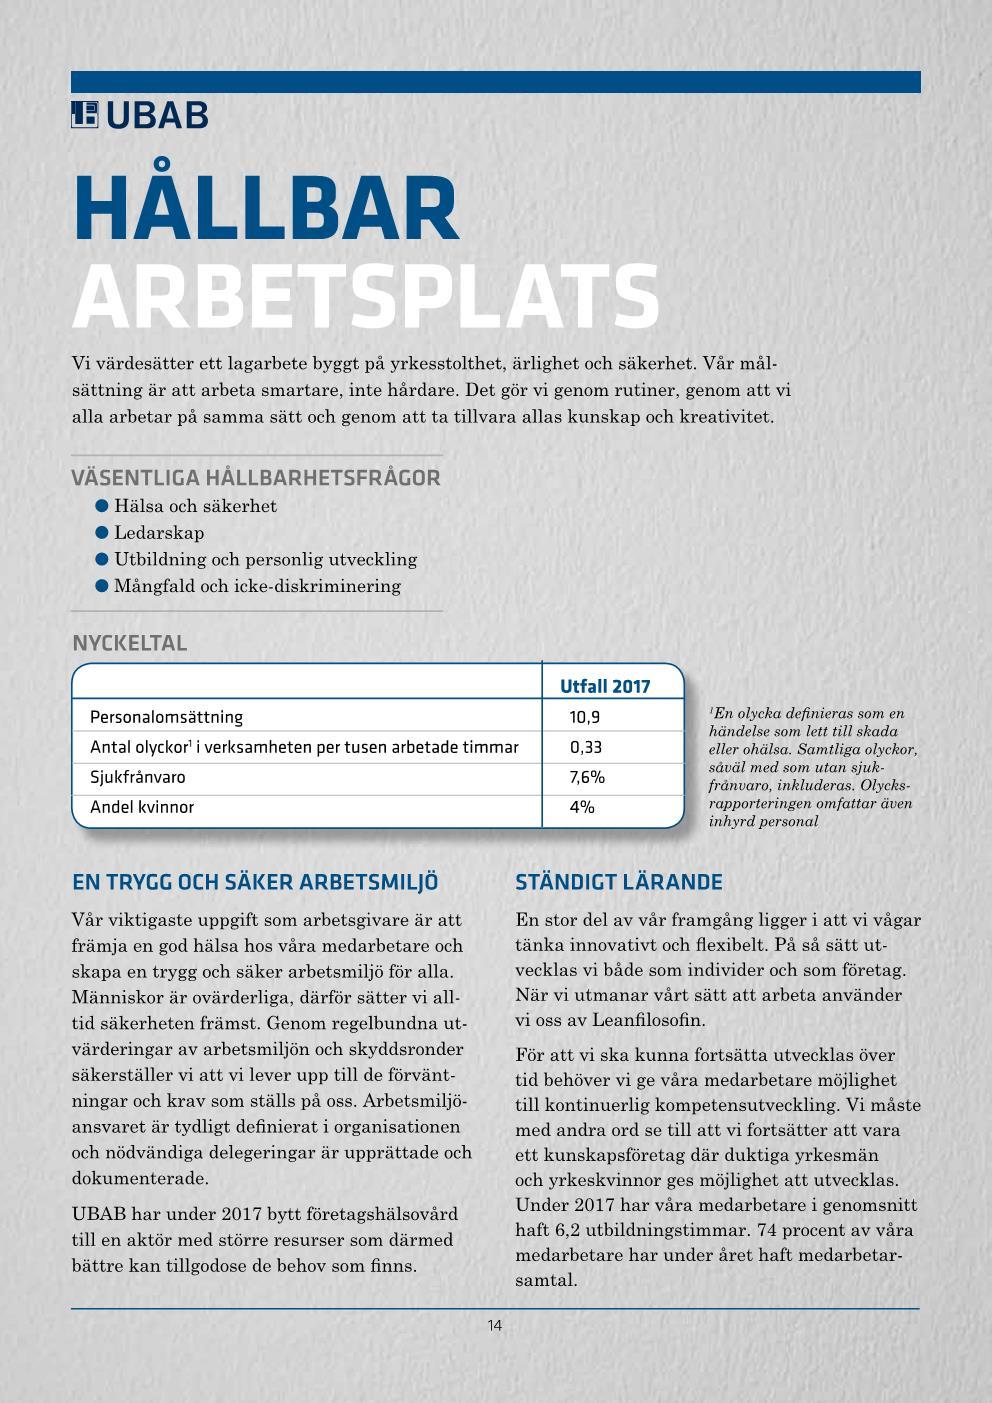 UBAB Hållbarhetsredovisning 2018_webres Sida 014